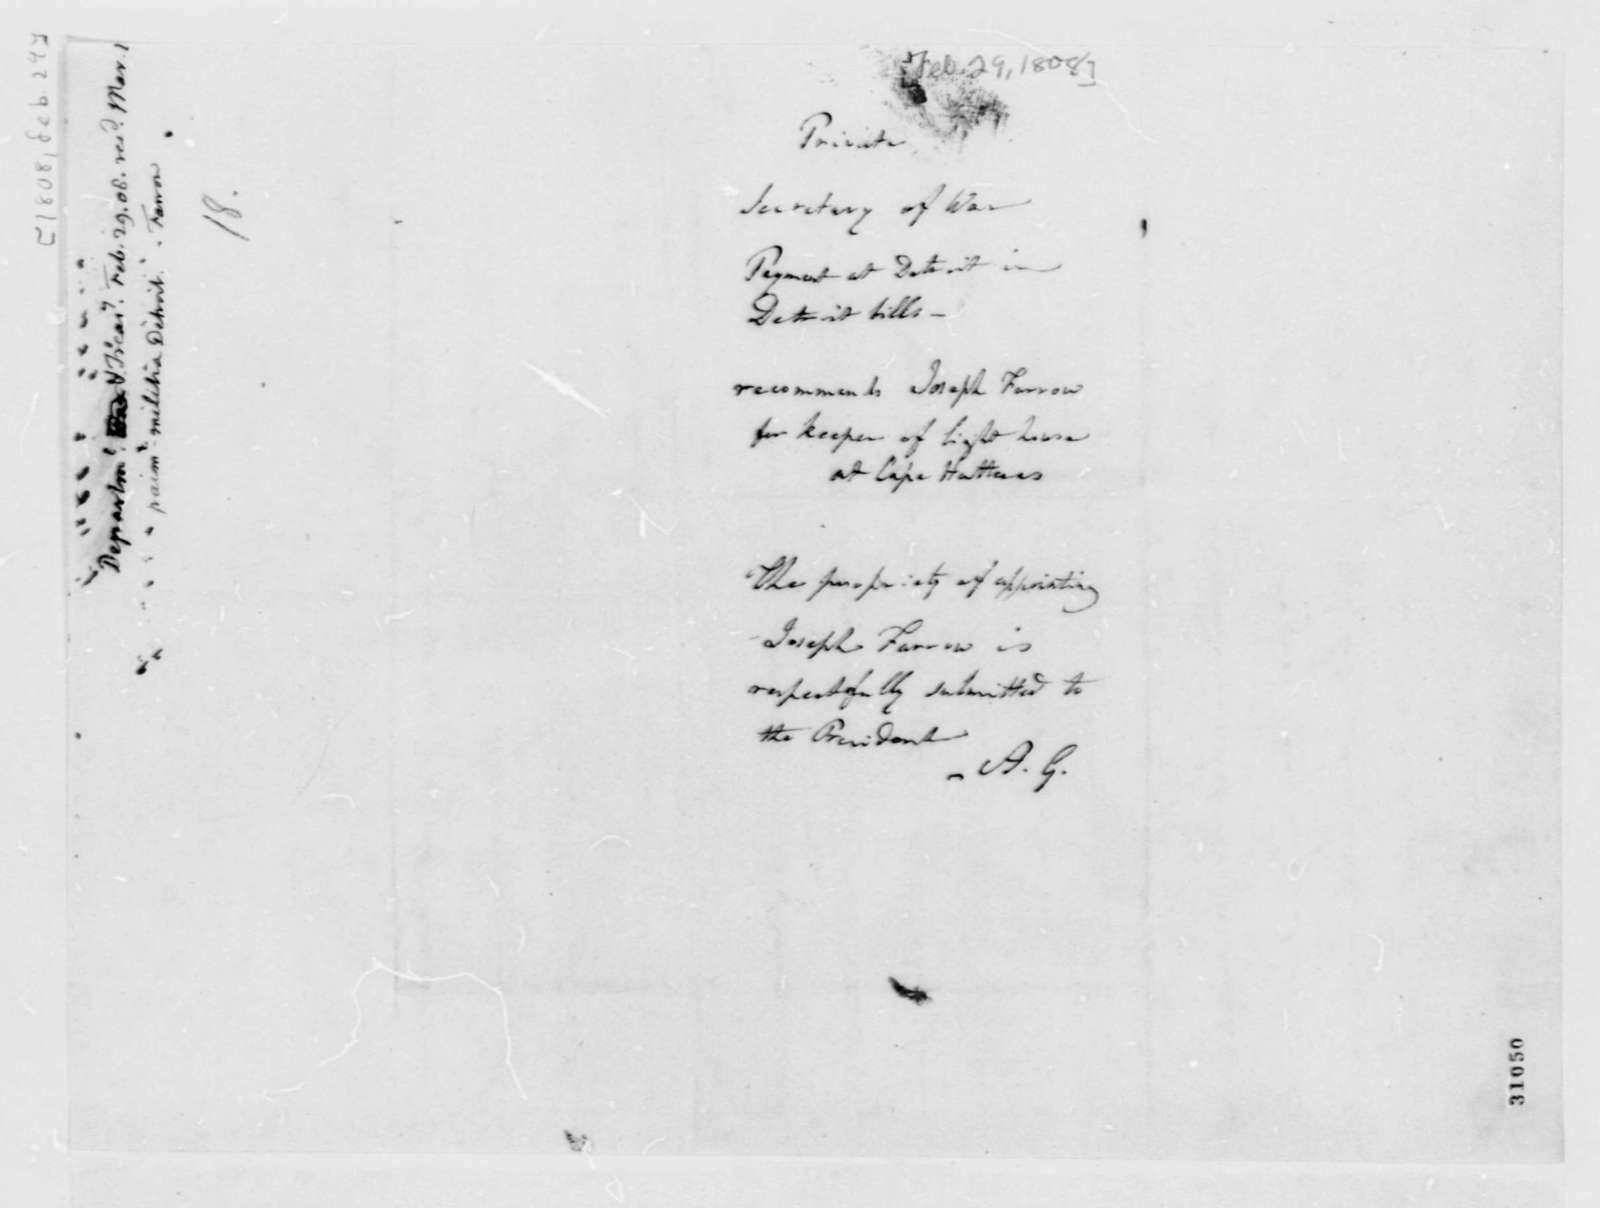 Henry Dearborn to Albert Gallatin, February 29, 1808